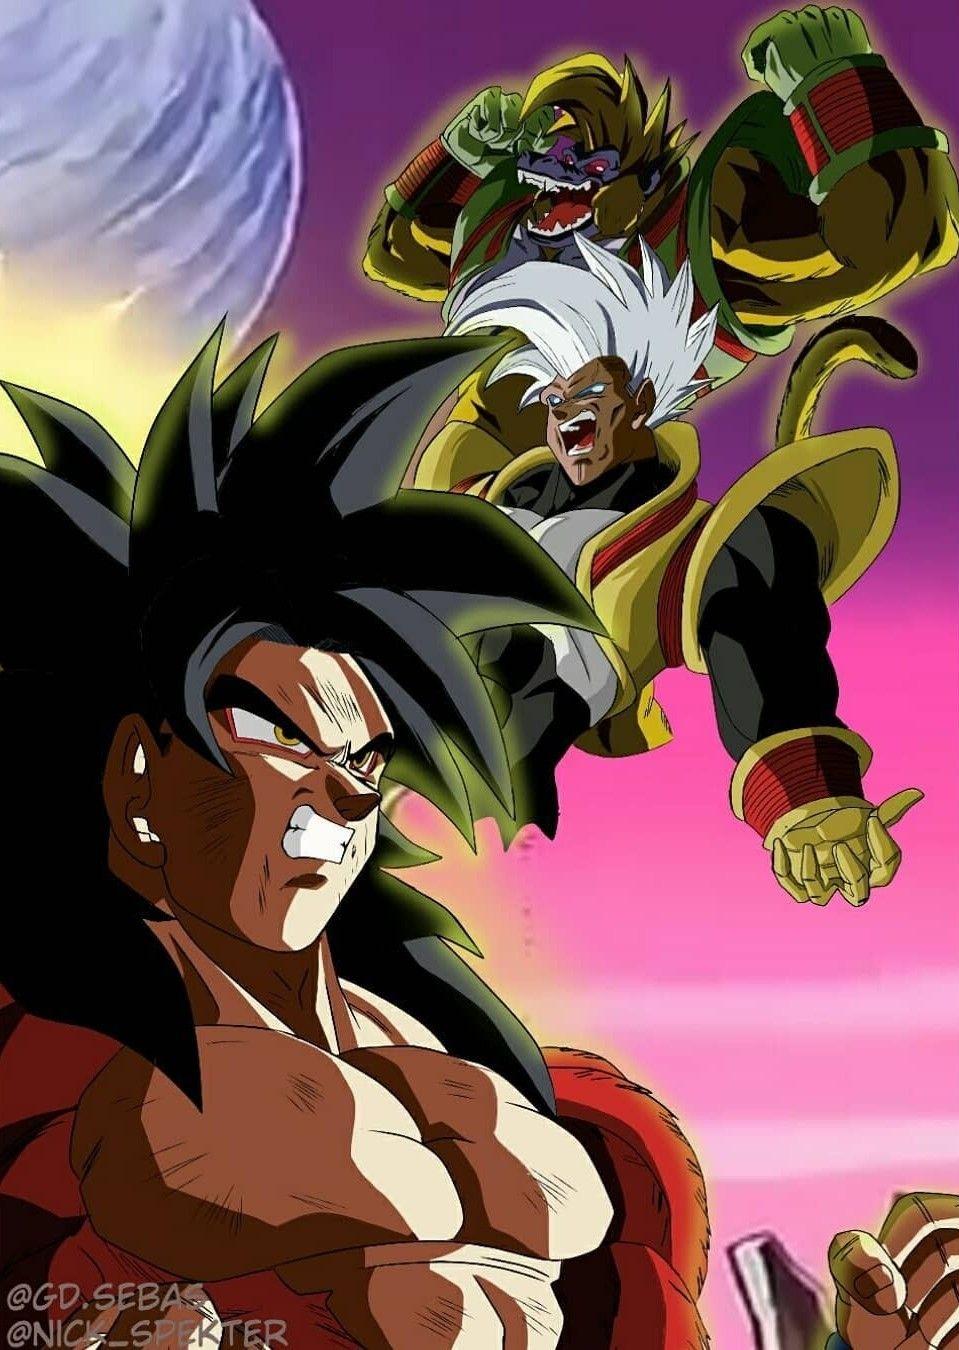 Goku Super Saiyan 4 Vs Baby Ozaru Dragon Ball Z Dragon Ball Super Goku Anime Dad